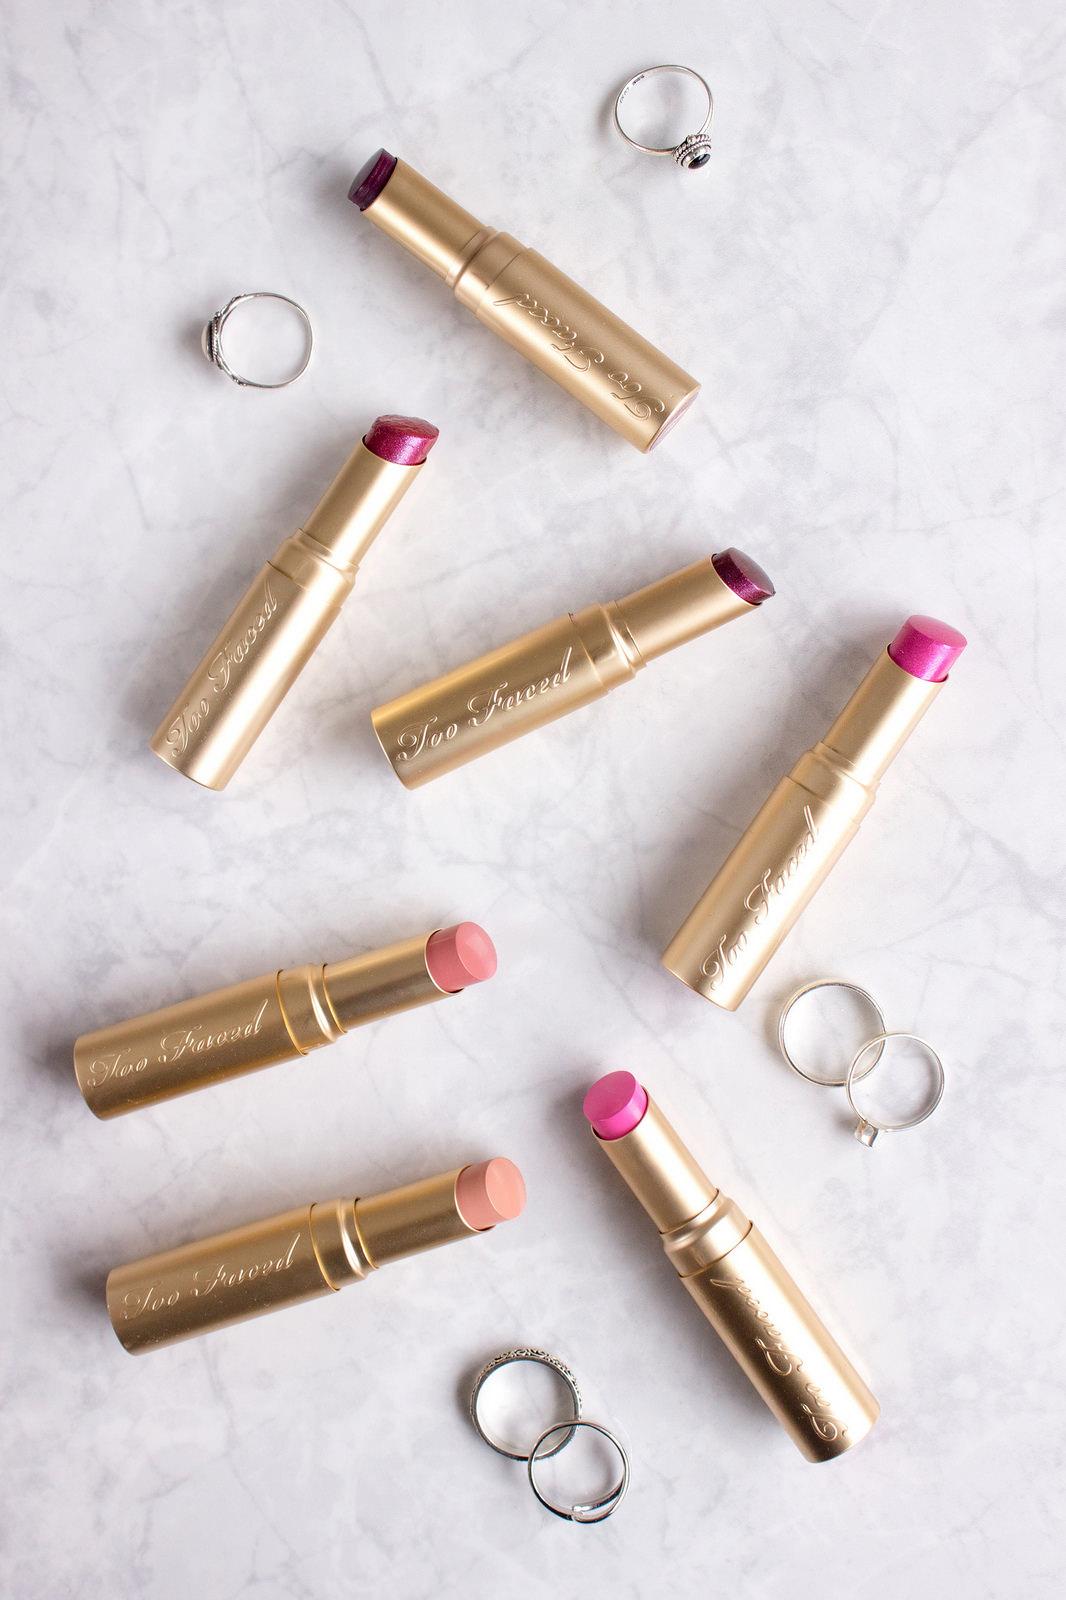 Too Faced La Crème Lipsticks